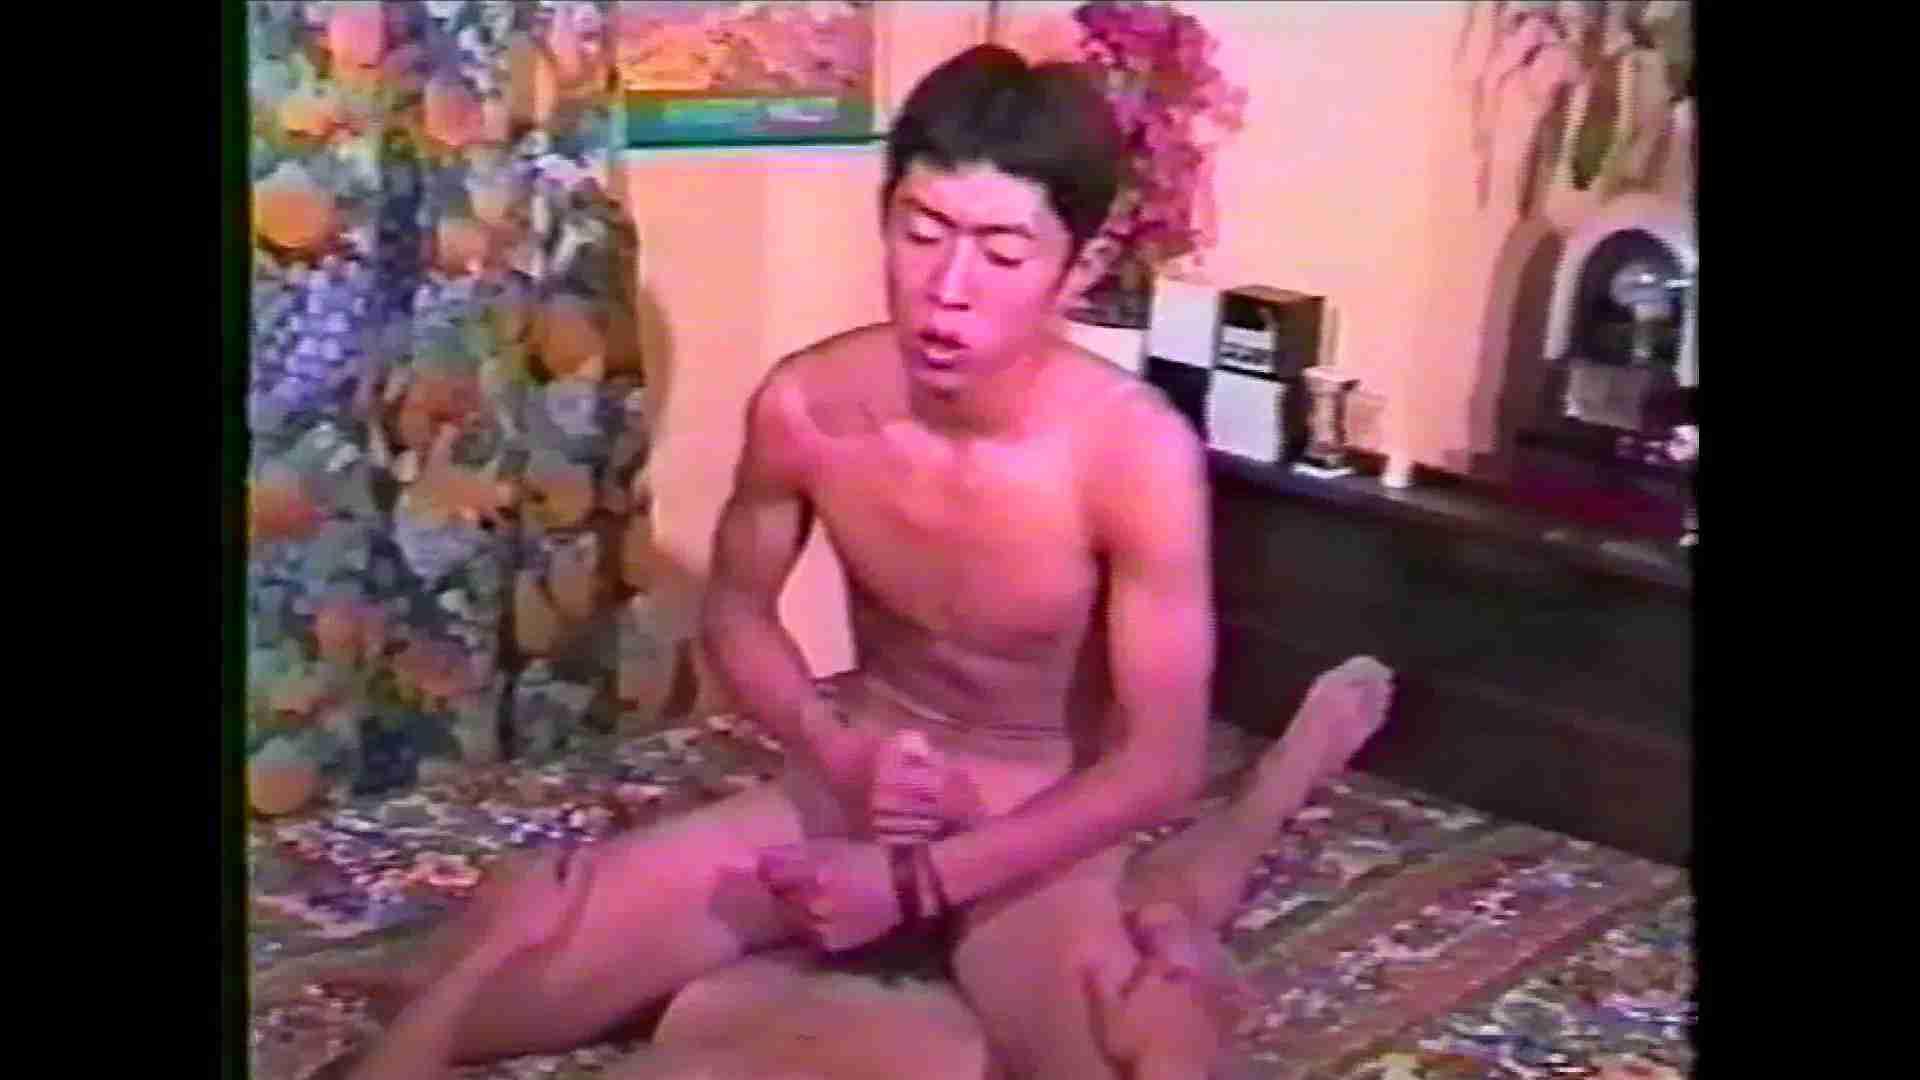 GAYBOY宏のオカズ倉庫Vol.12-2 シックスナイン69 | 風呂天国 ゲイヌード画像 99枚 92